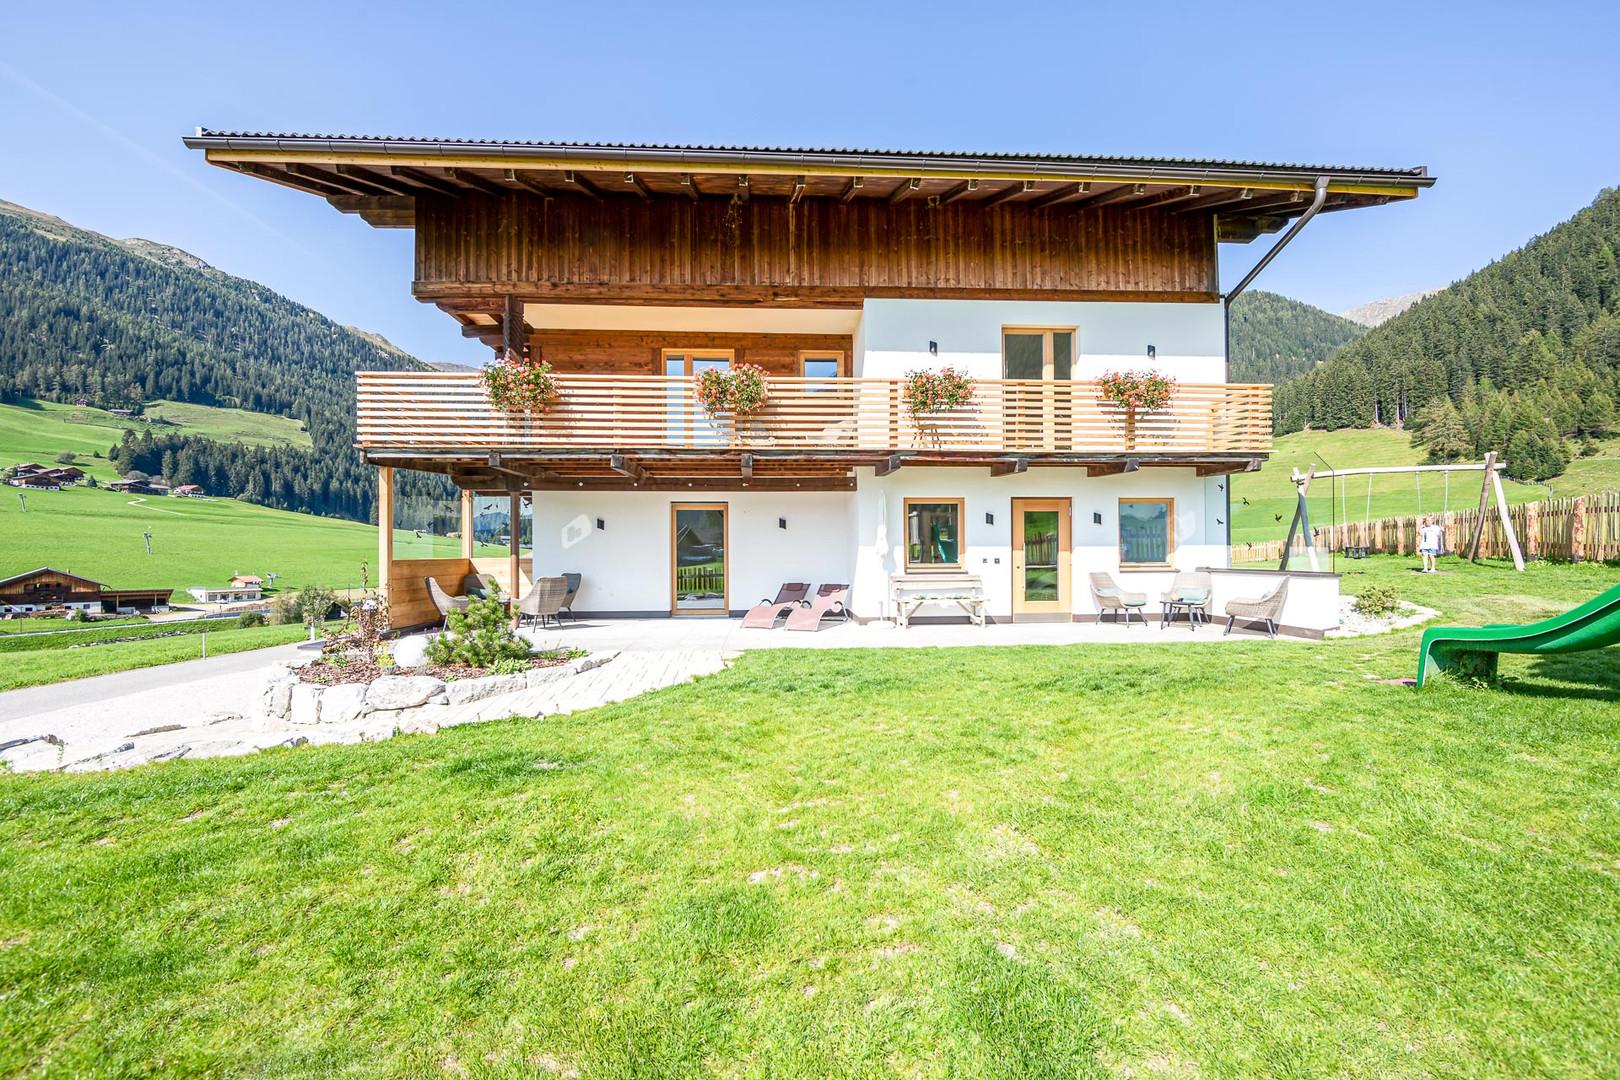 Residence_Alpina_Gsies-14.jpg